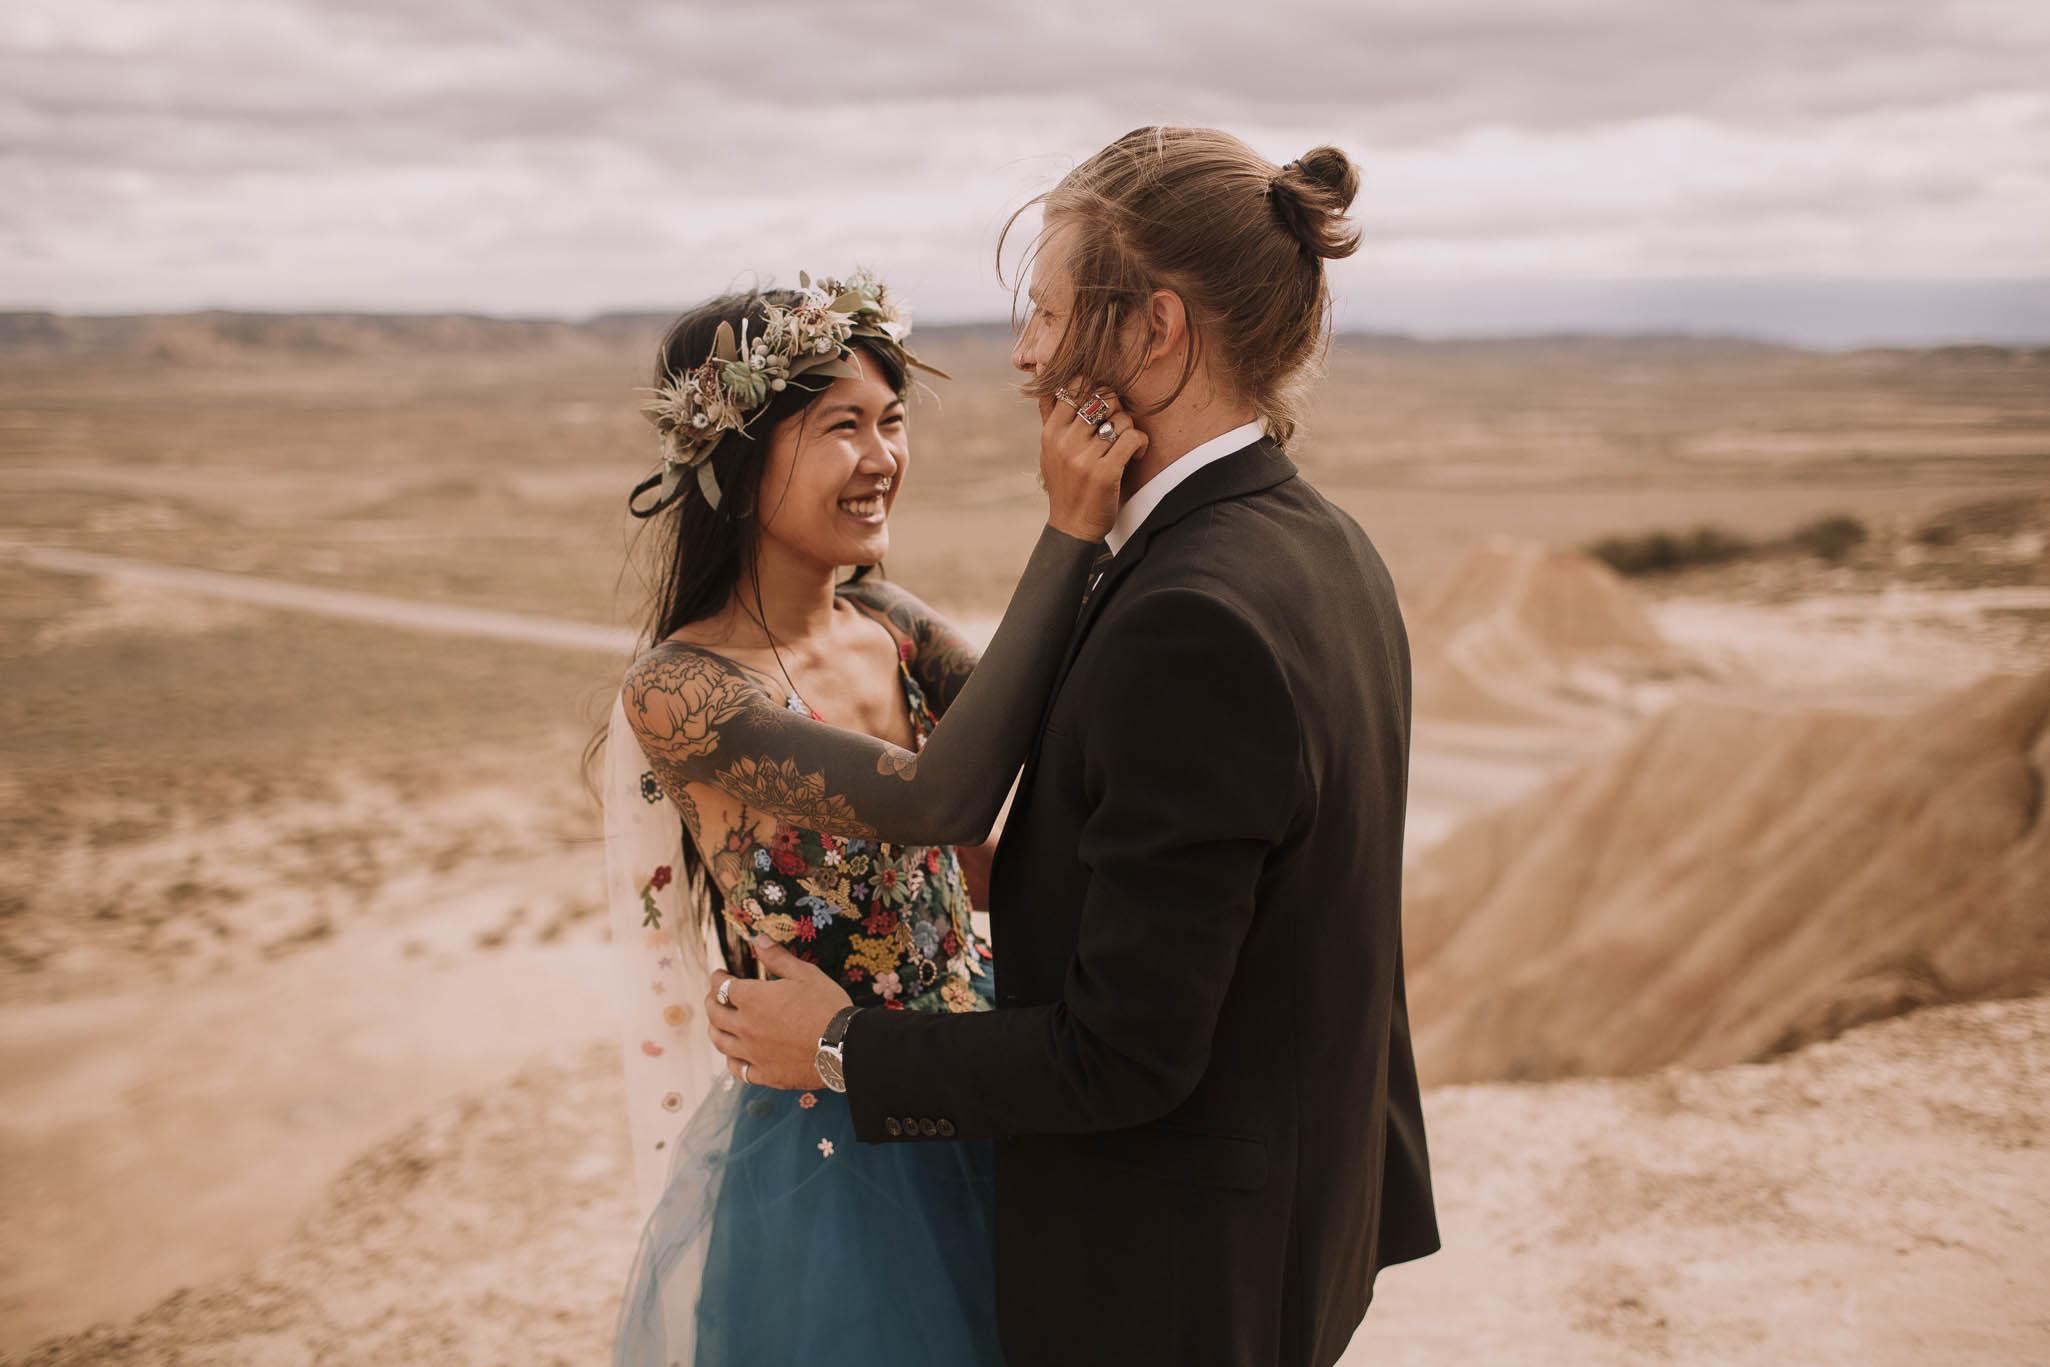 Spain-wedding-photographer-bardenas-reales-jeremy-boyer-photographe-mariage-bordeaux-floral-wedding-dress-robe-110.jpg